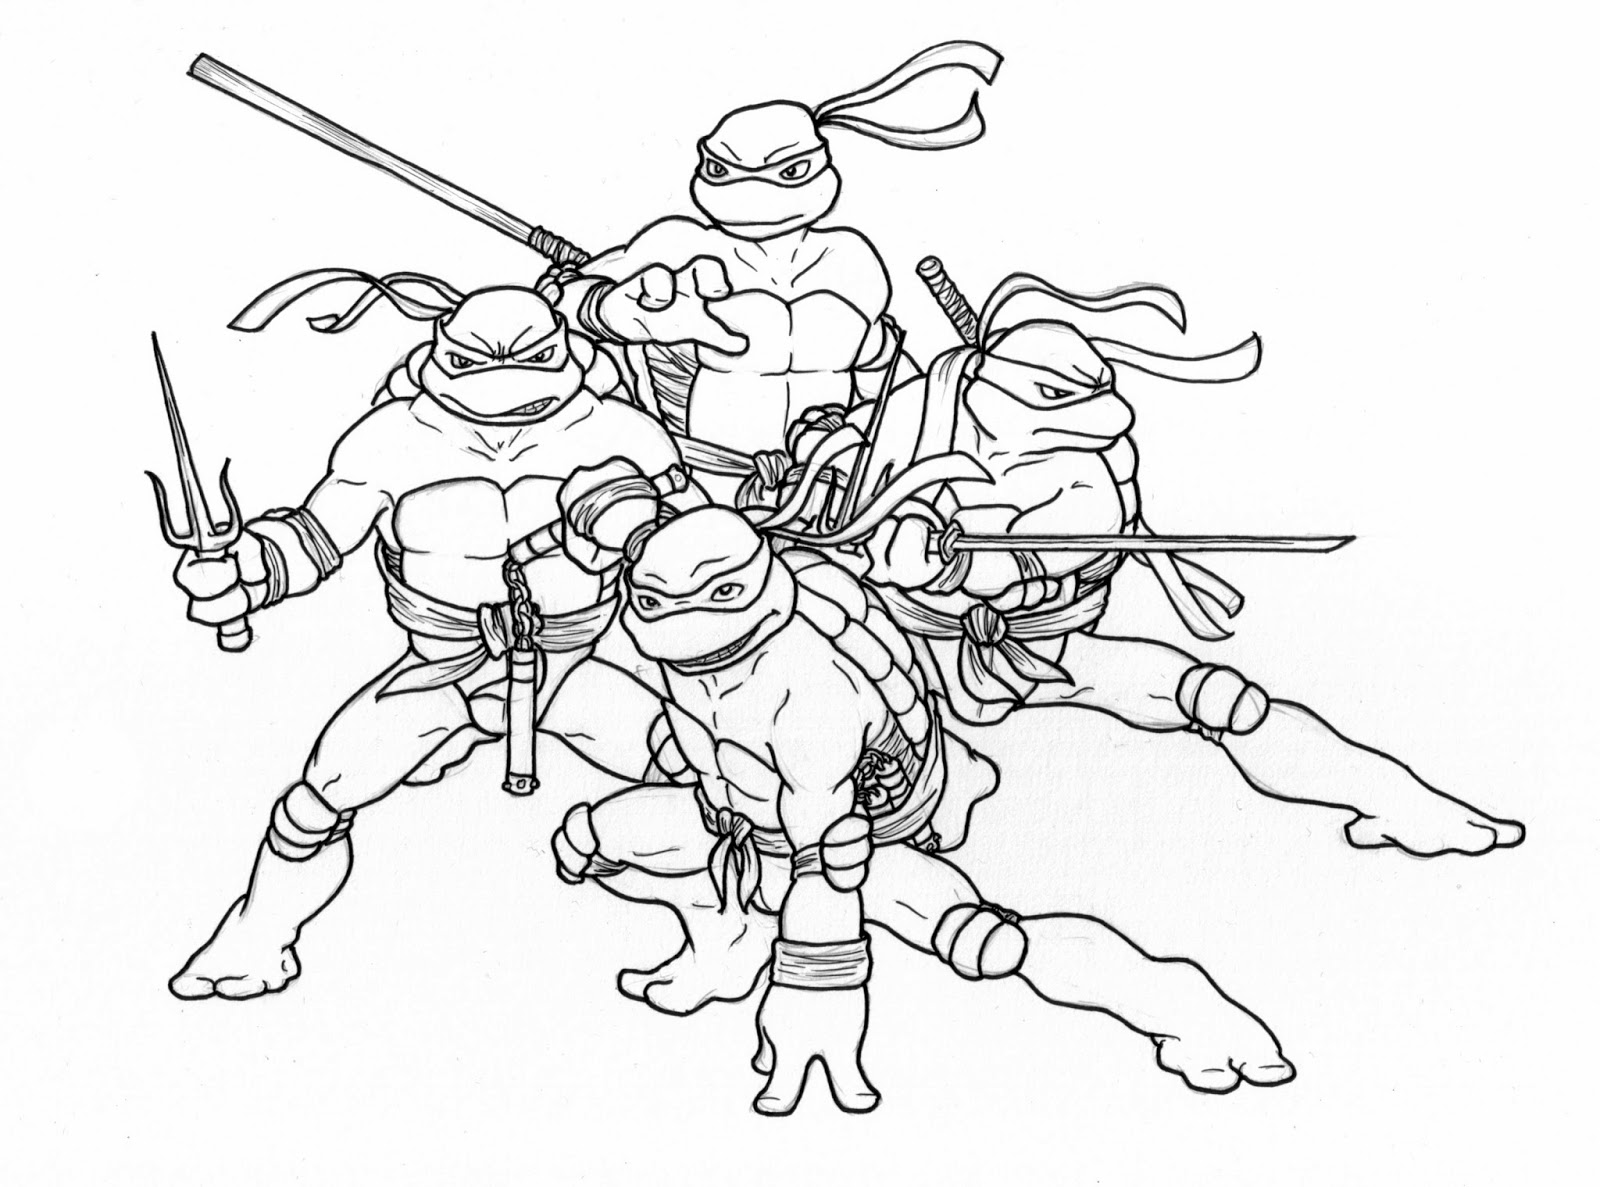 color ninja turtles 2017 10 01 coloring pages galleries ninja color turtles